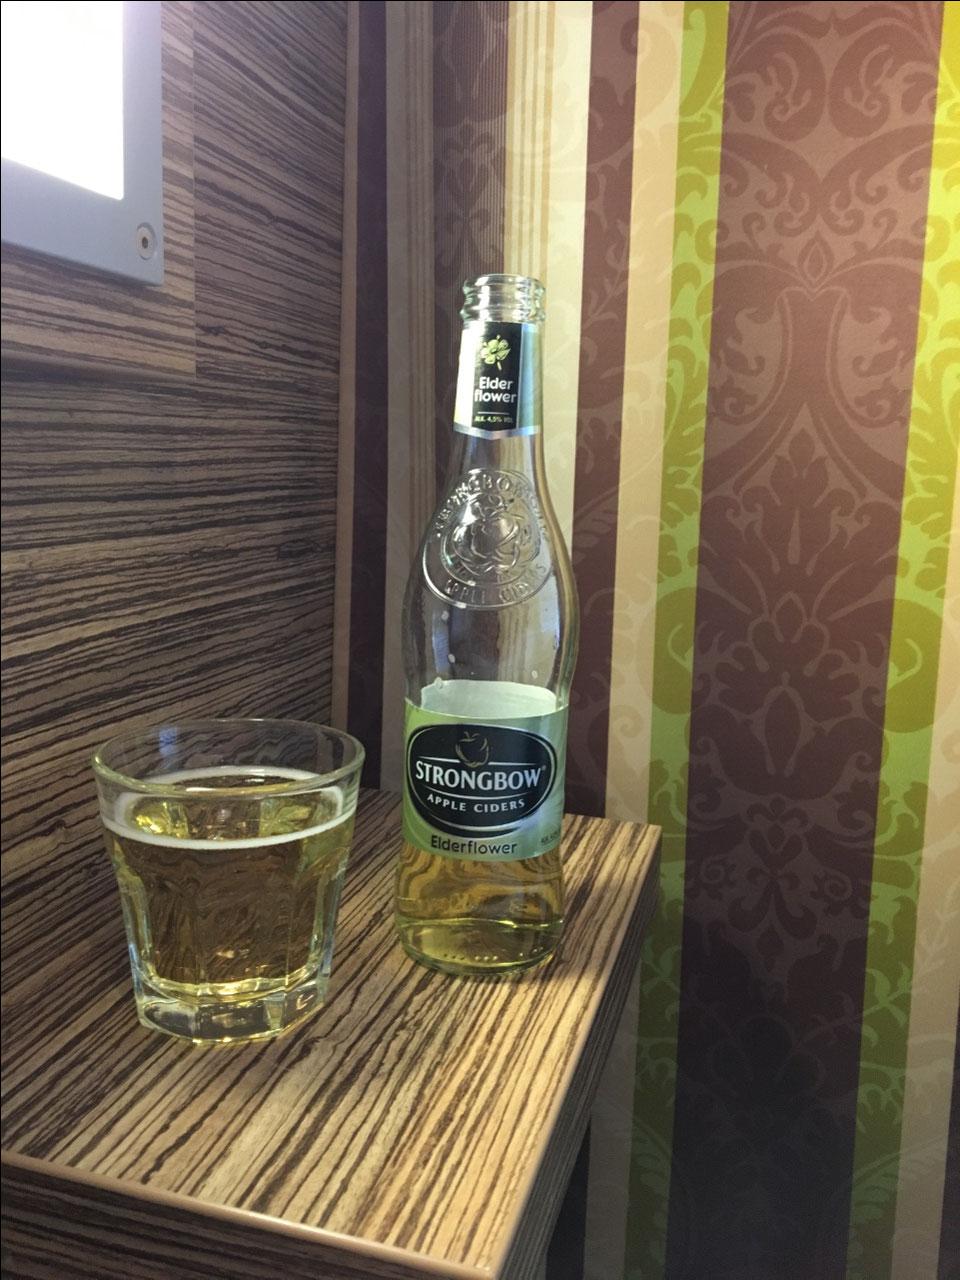 FINALLY!  Some Cider